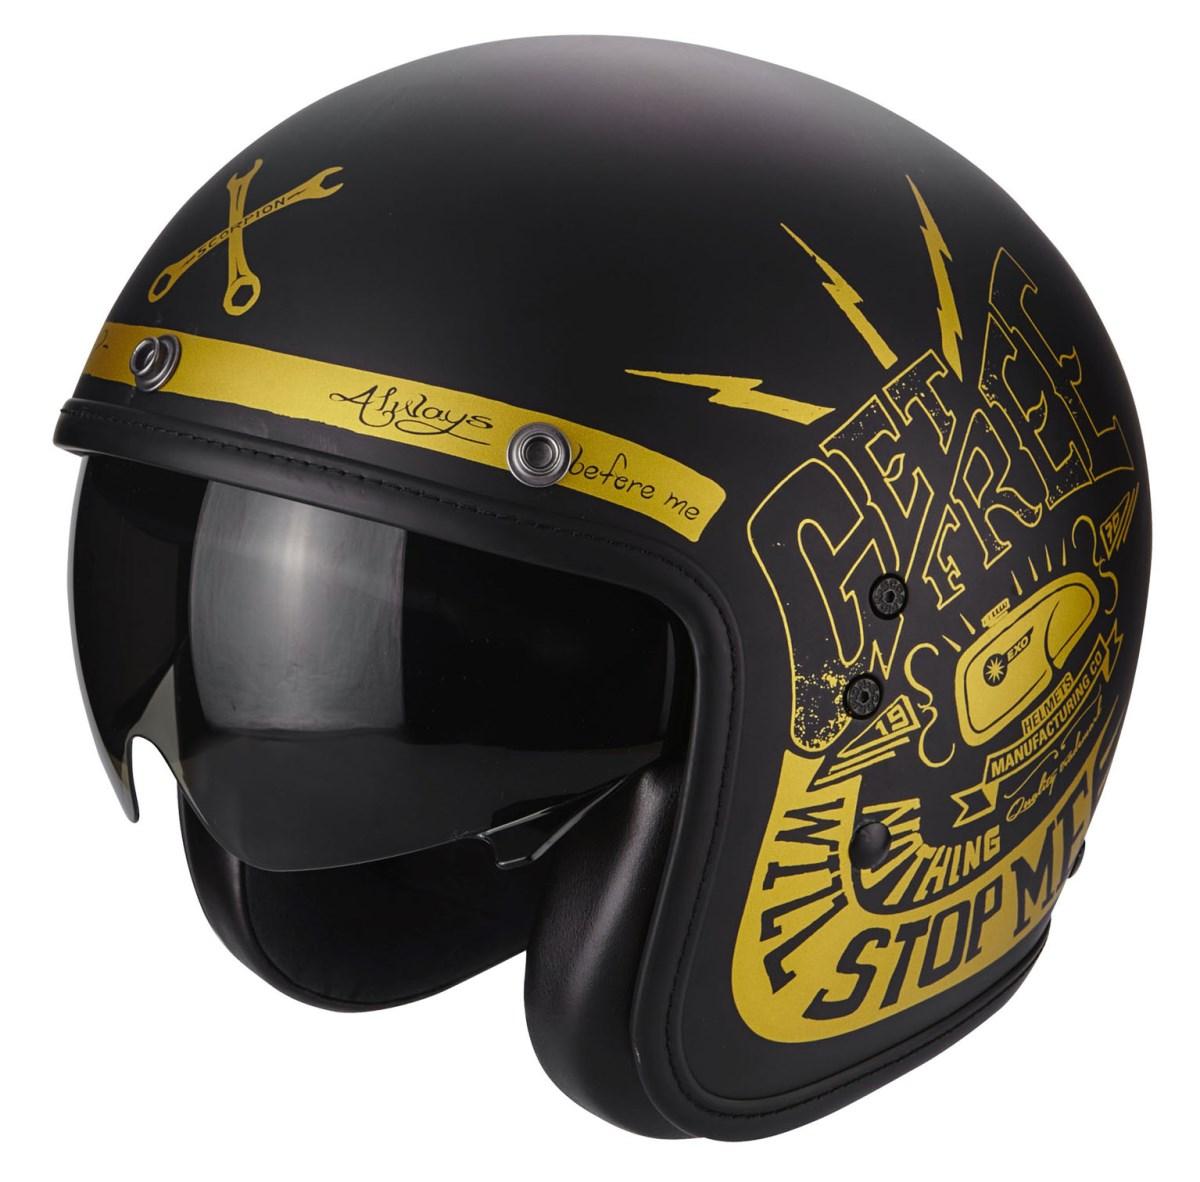 Motori360_SCORPION - BELFAST FENDER black gold